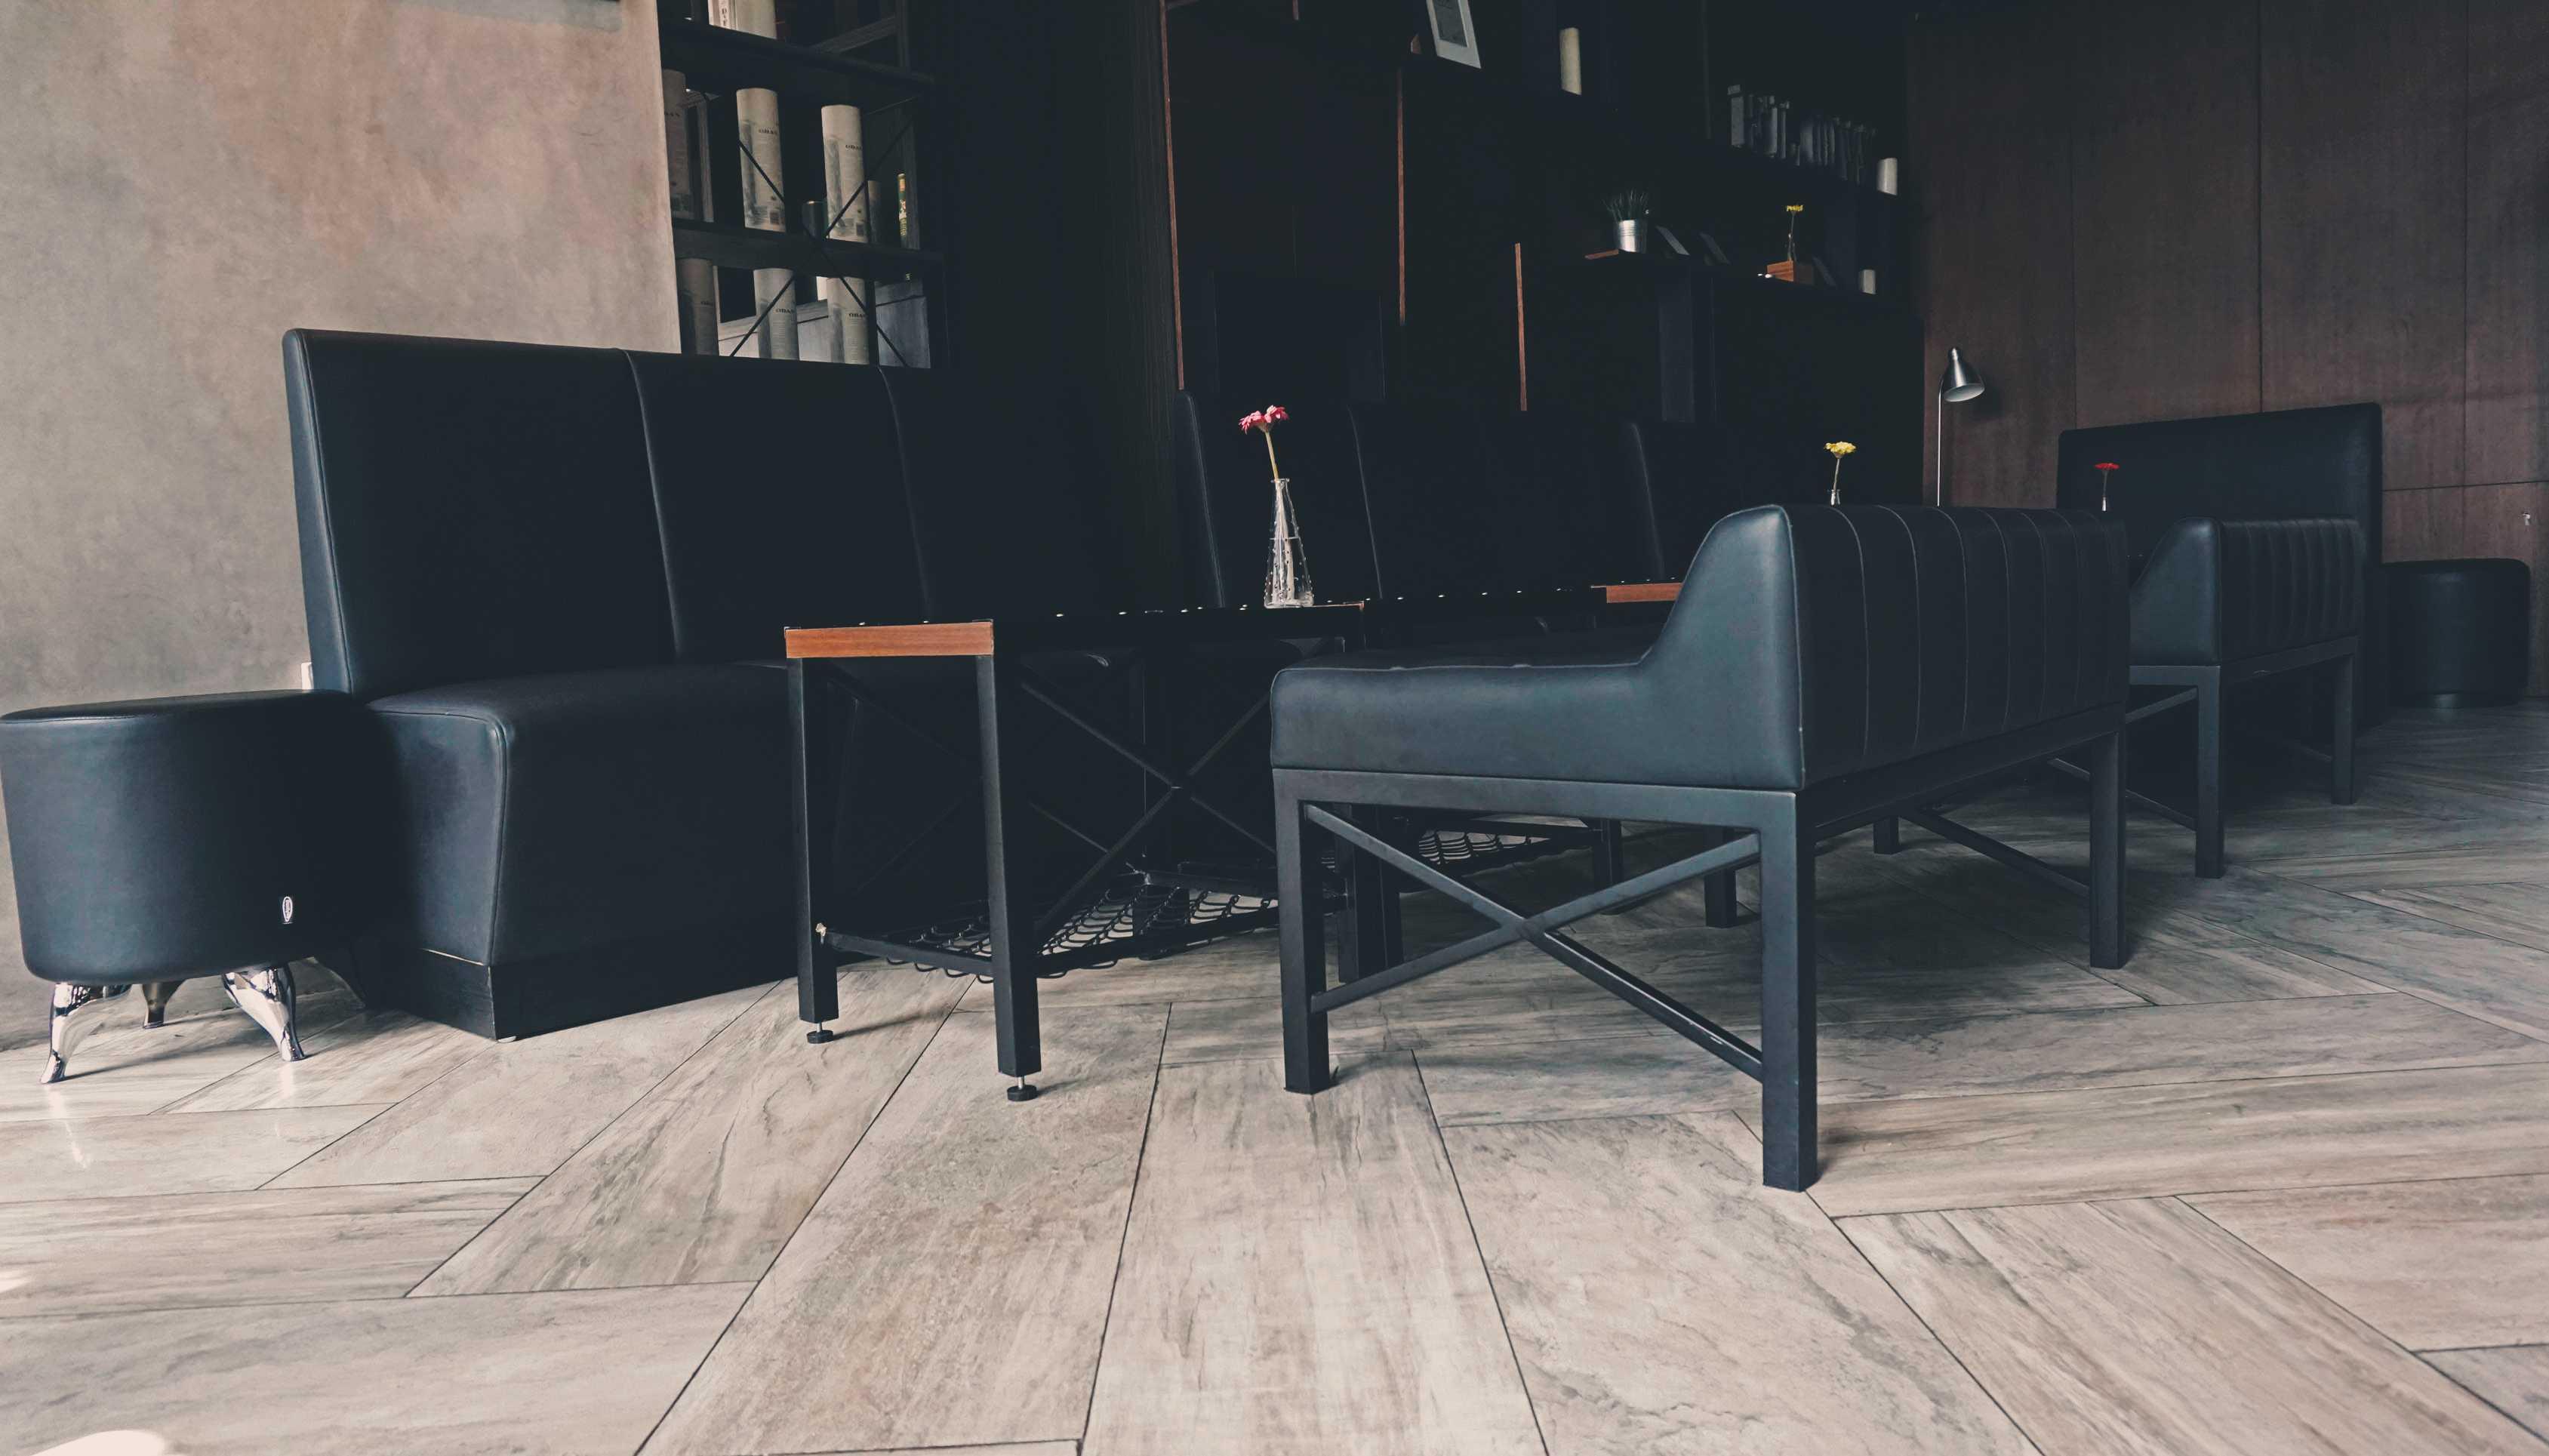 Gilang Kamajati 5 Elements Creation Architecture In Flow Bar & Lounge Cbd Mega Kuningan, Jl. Dr. Ide Anak Agung Gde Agung Kav 5.5 - 5.6, Setiabudi, Rt.5/rw.2, Kuningan Timur, Rt.5/rw.2, Kuningan Tim., Setia Budi, Kota Jakarta Selatan, Daerah Khusus Ibukota Jakarta 12950, Indonesia  2016-08-17-01   35759